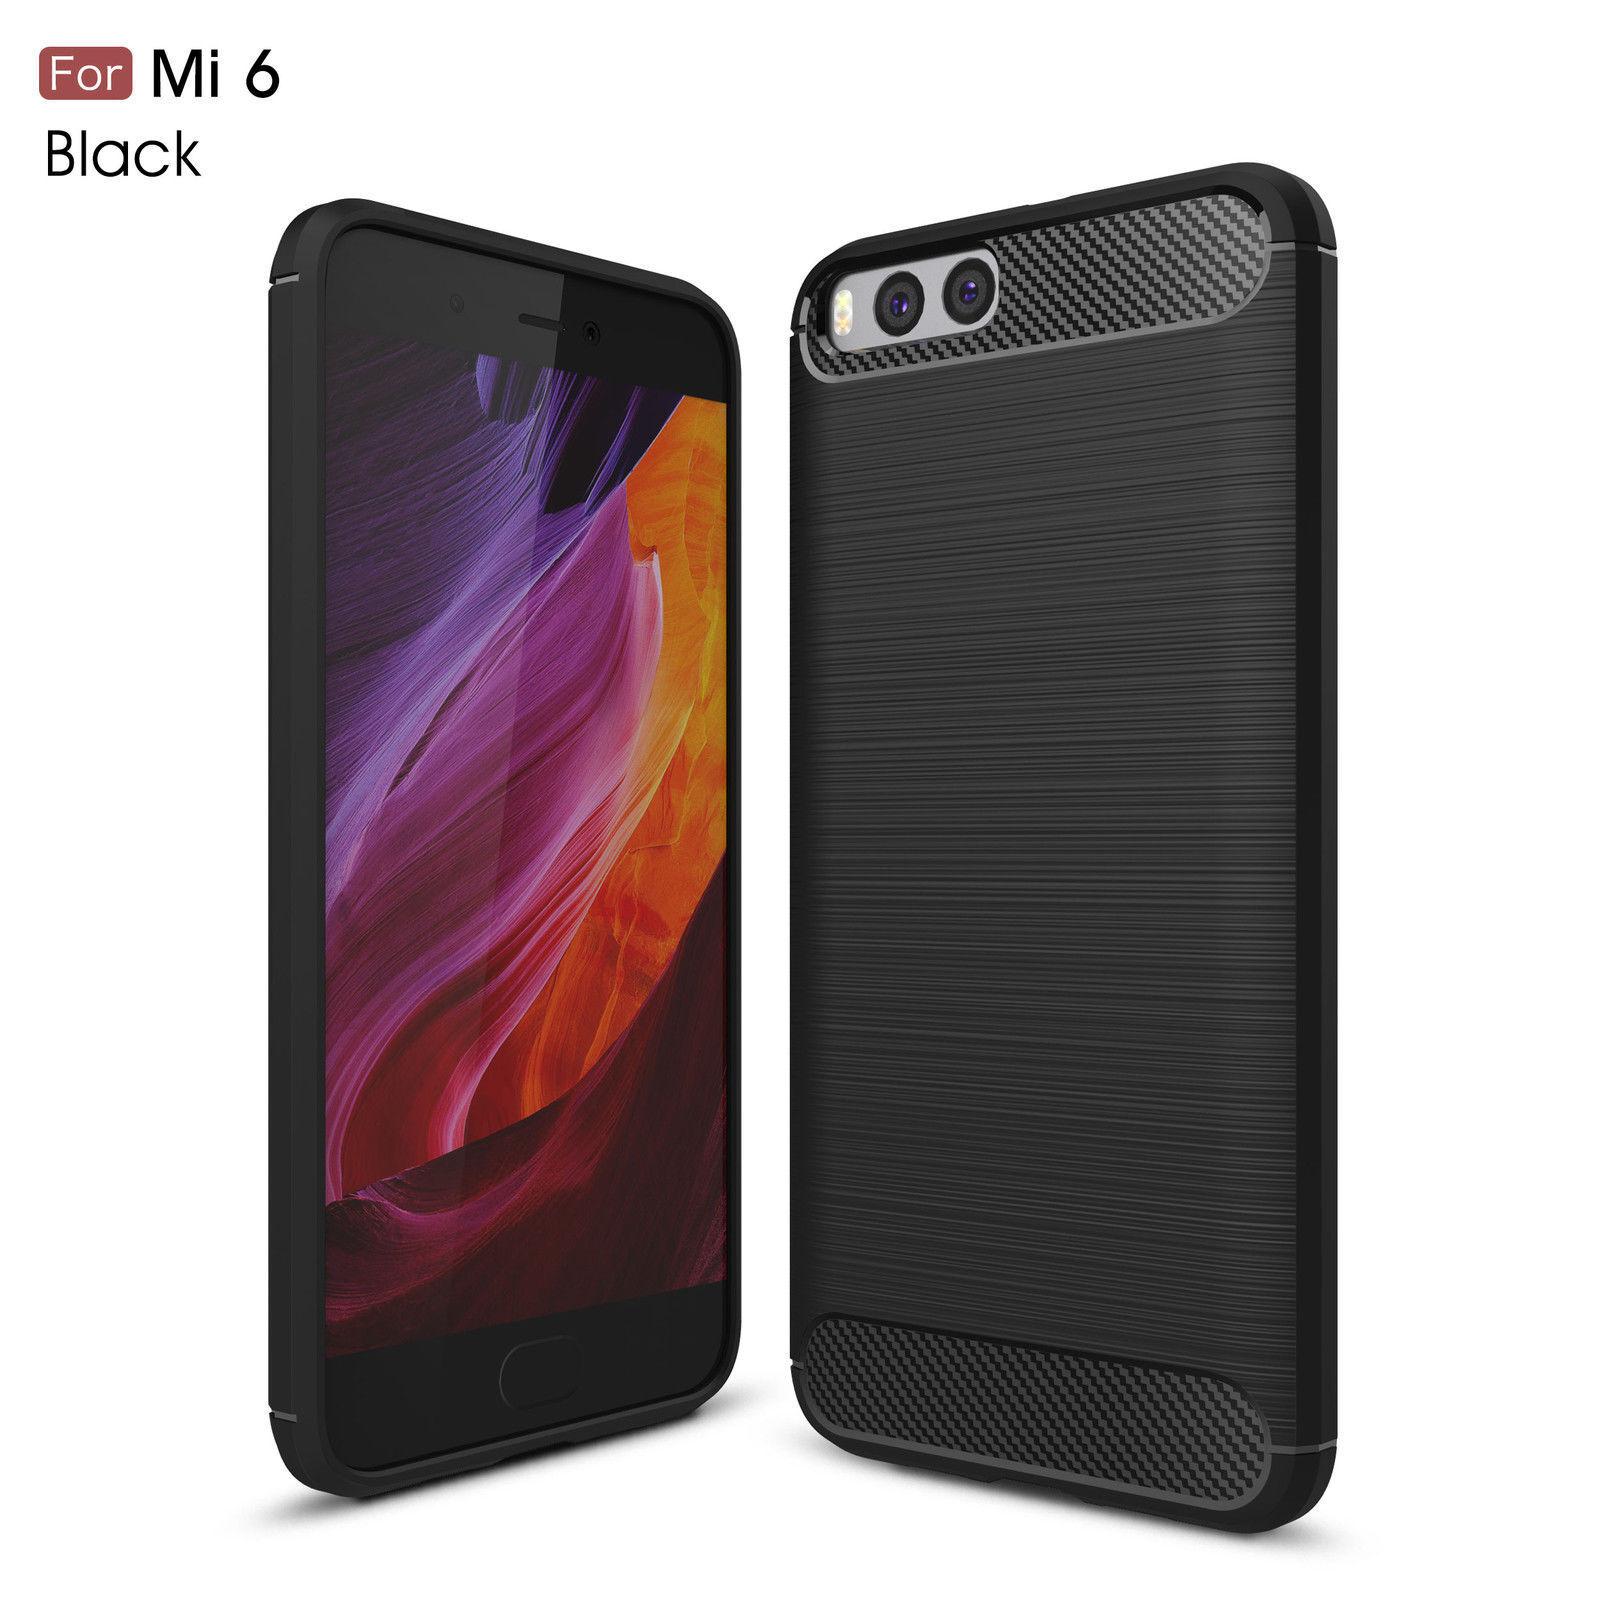 Luxury Carbon Fiber Tpu Gel Case Cover For Xiaomi Redmi Note 3 4 5 Temperred Glass Softcase 4s 4a 4x 5a